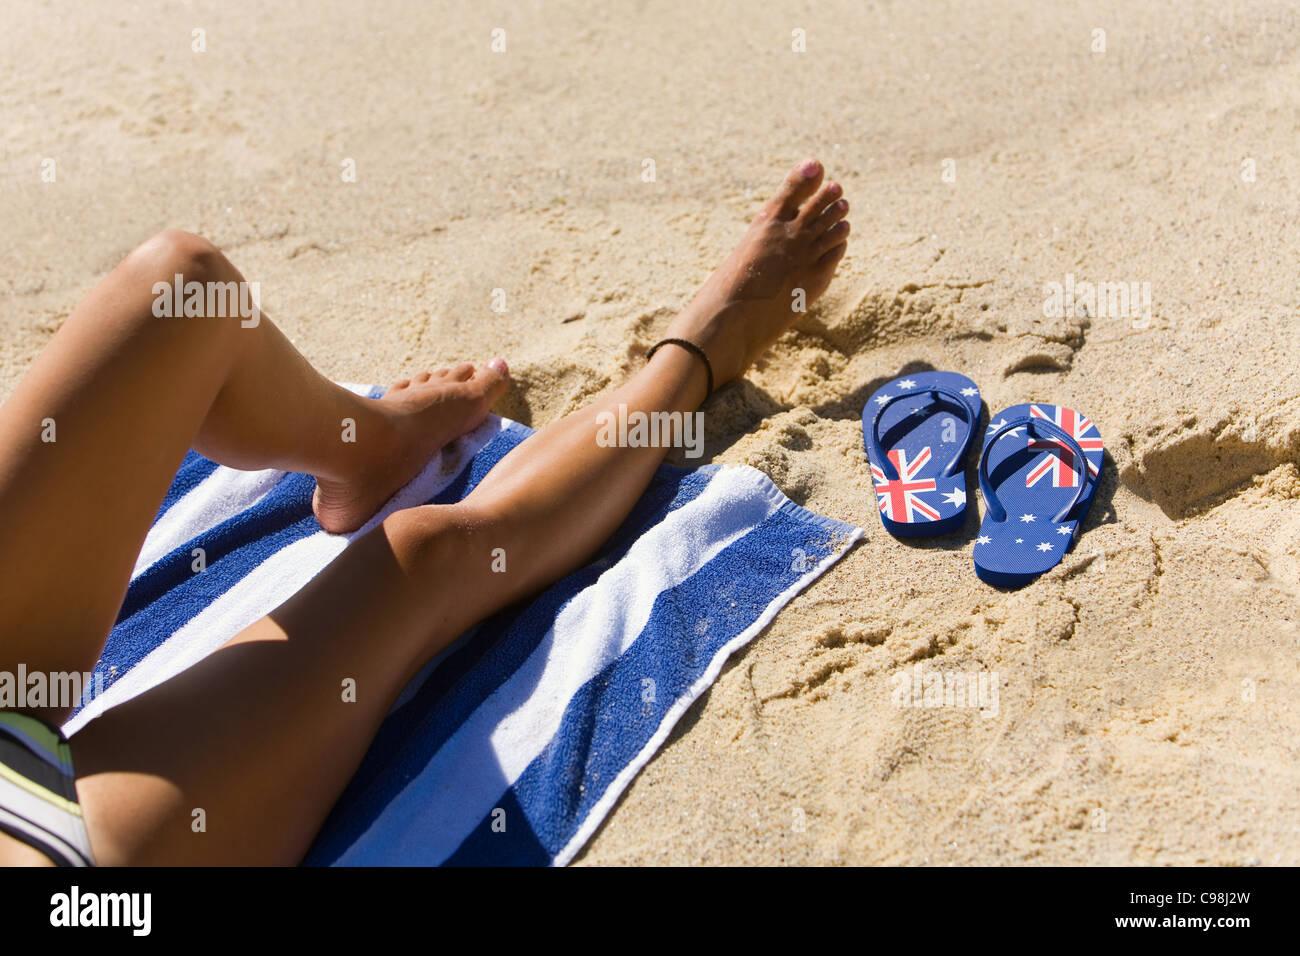 339eeffc2ab266 Sunbather on the beach with Australian flag flip flops. Bondi Beach ...